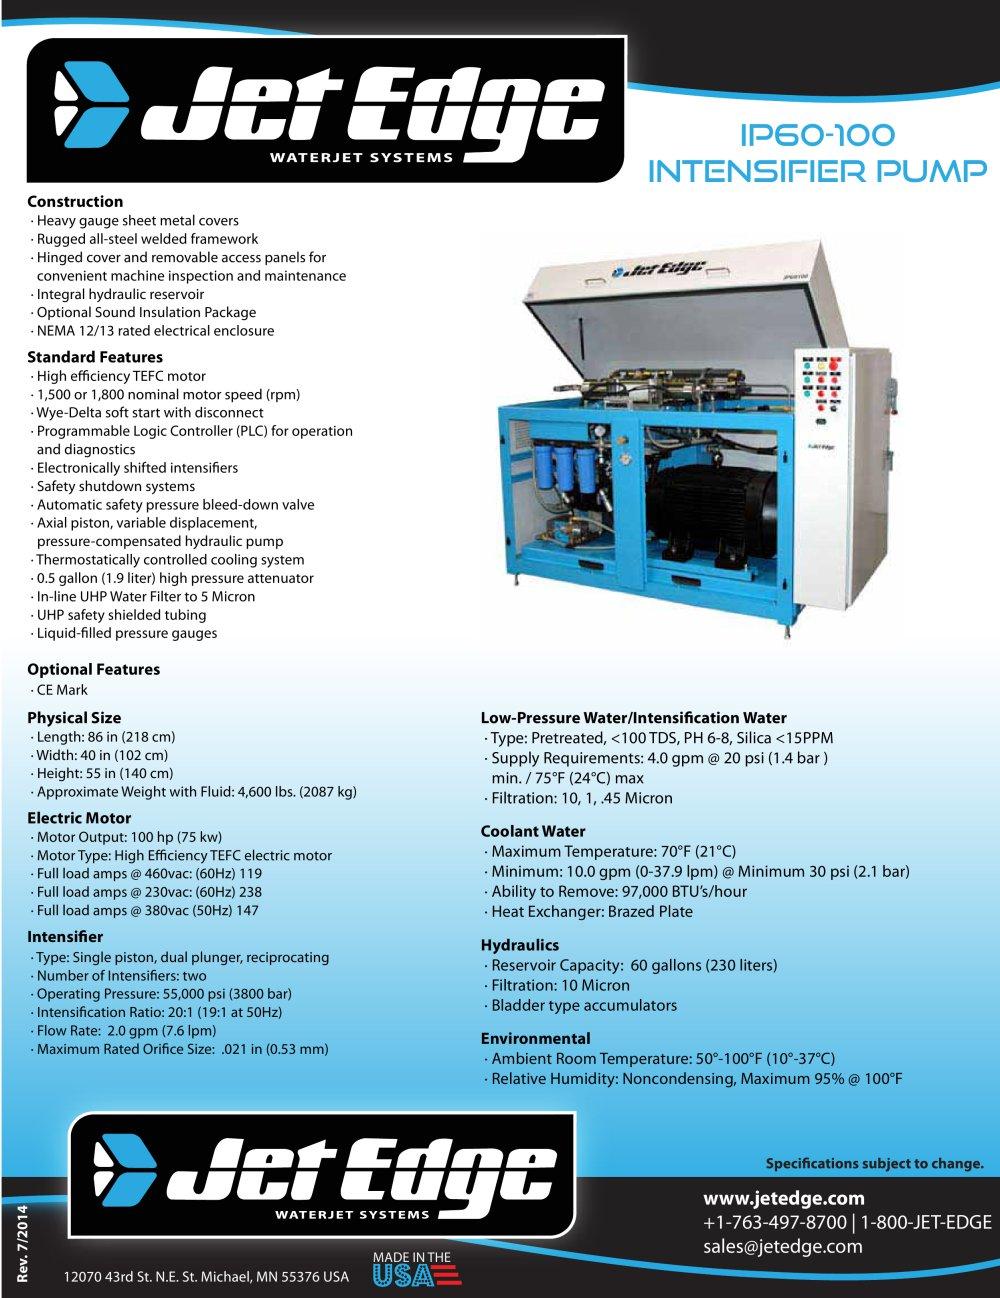 Ip60 100 Waterjet Intensifier Pump 1 Pages